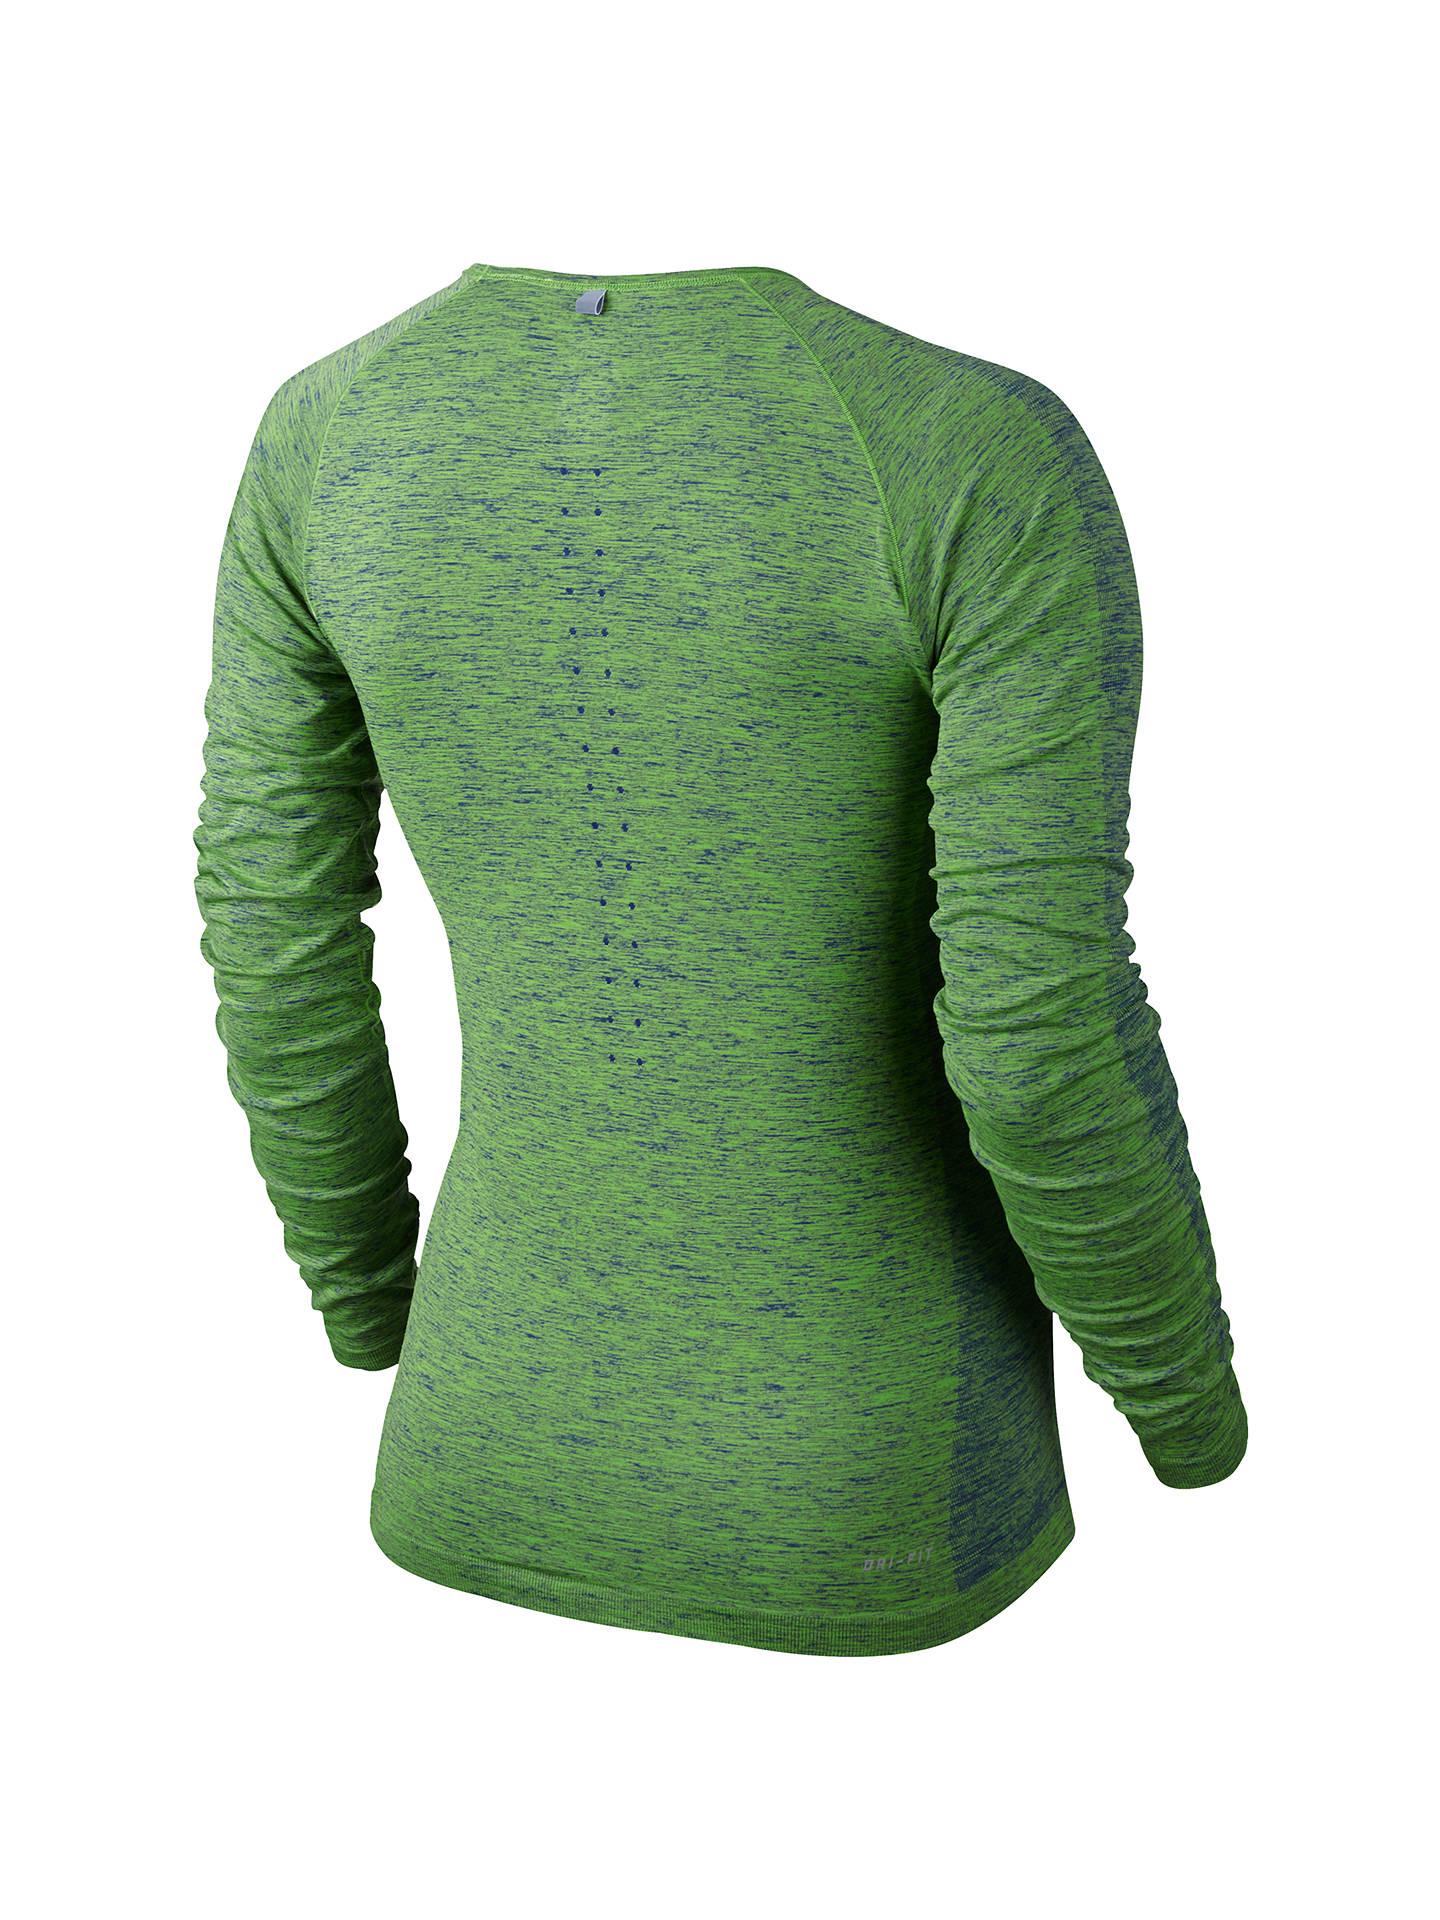 acd8115da ... Buy Nike Dri-FIT Knit Long Sleeve Running Top, Deep Royal Blue/Action  ...